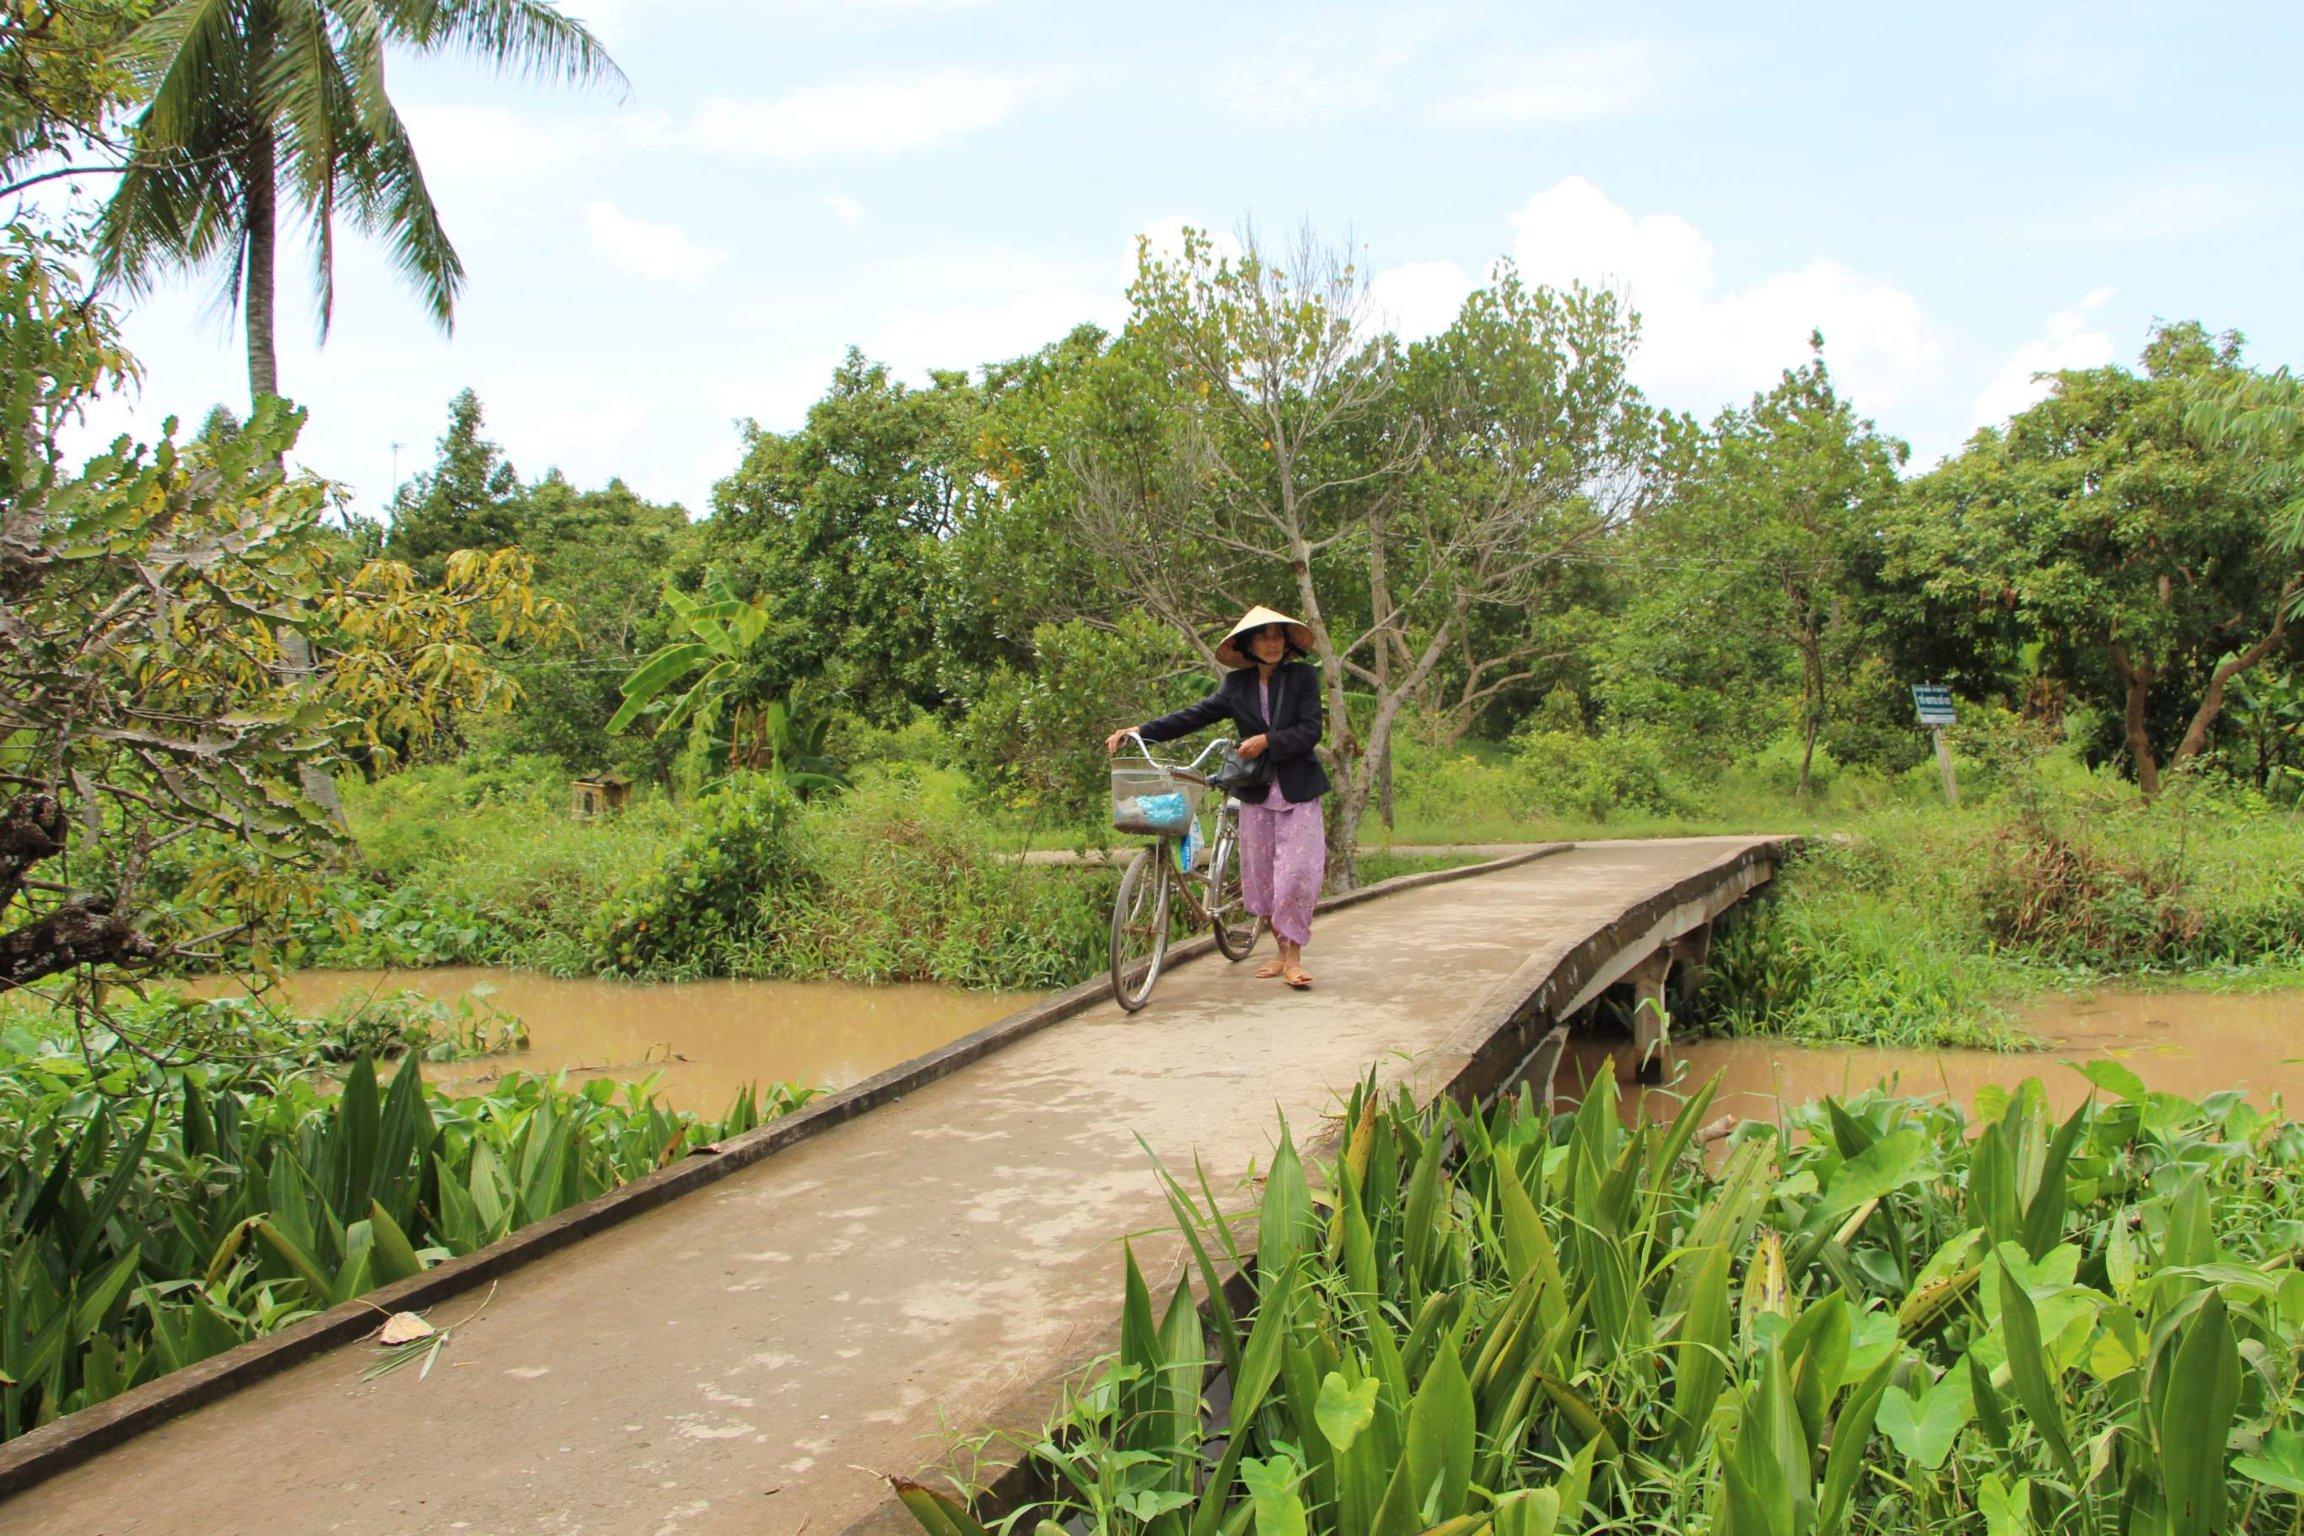 10-Day Homestays along the Mekong: Vietnam & Cambodia - Vietnam and Cambodia Itinerary